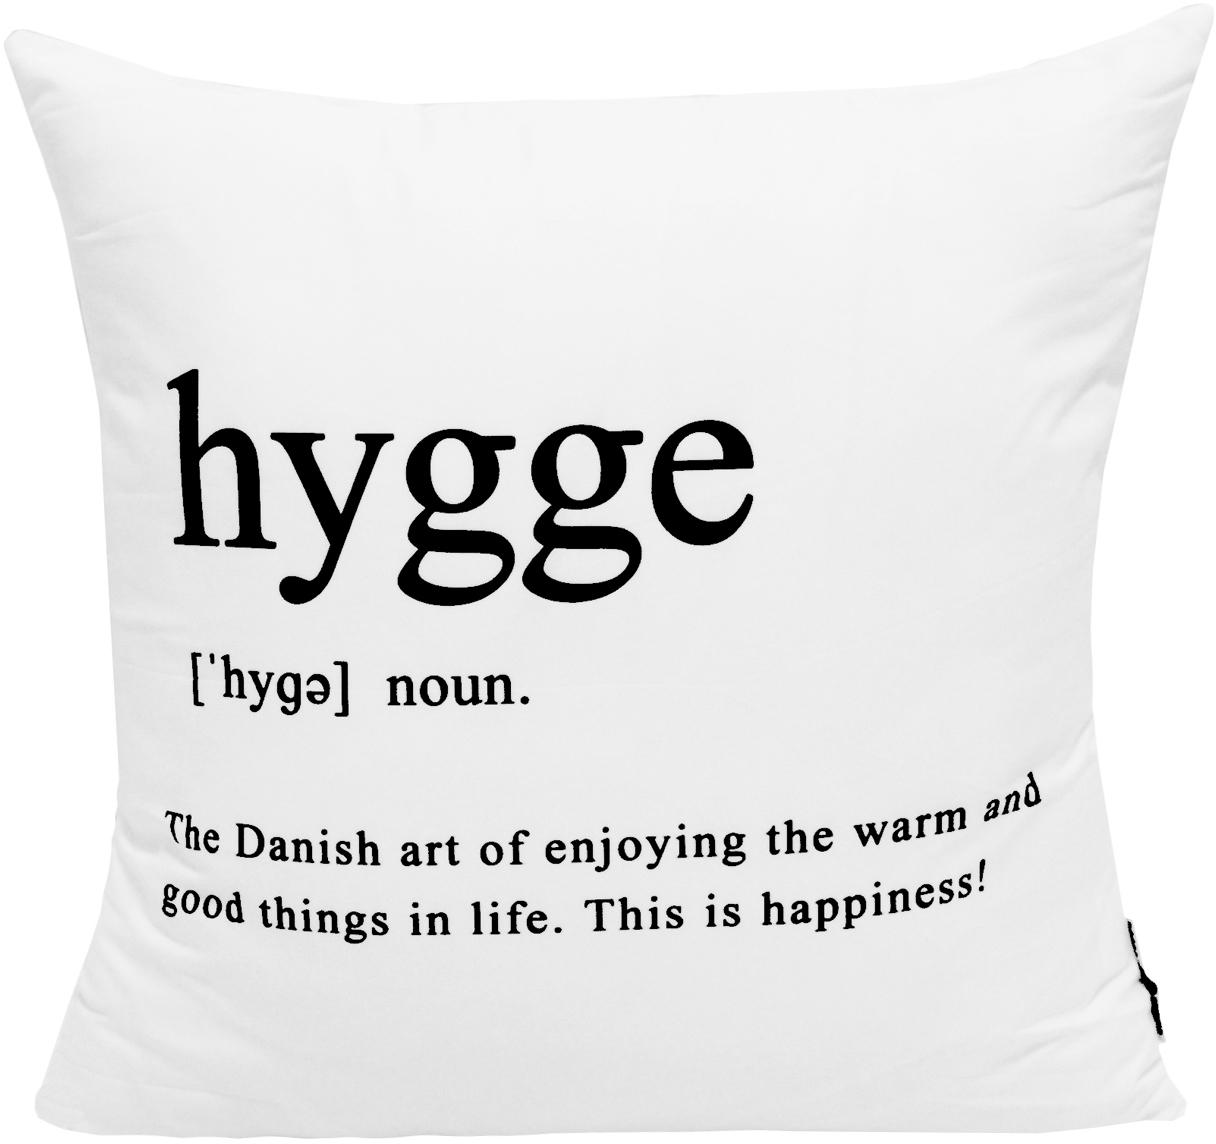 Kussenhoes Hygge in zwart/wit met opschrift, 100% polyester, Zwart, wit, 45 x 45 cm